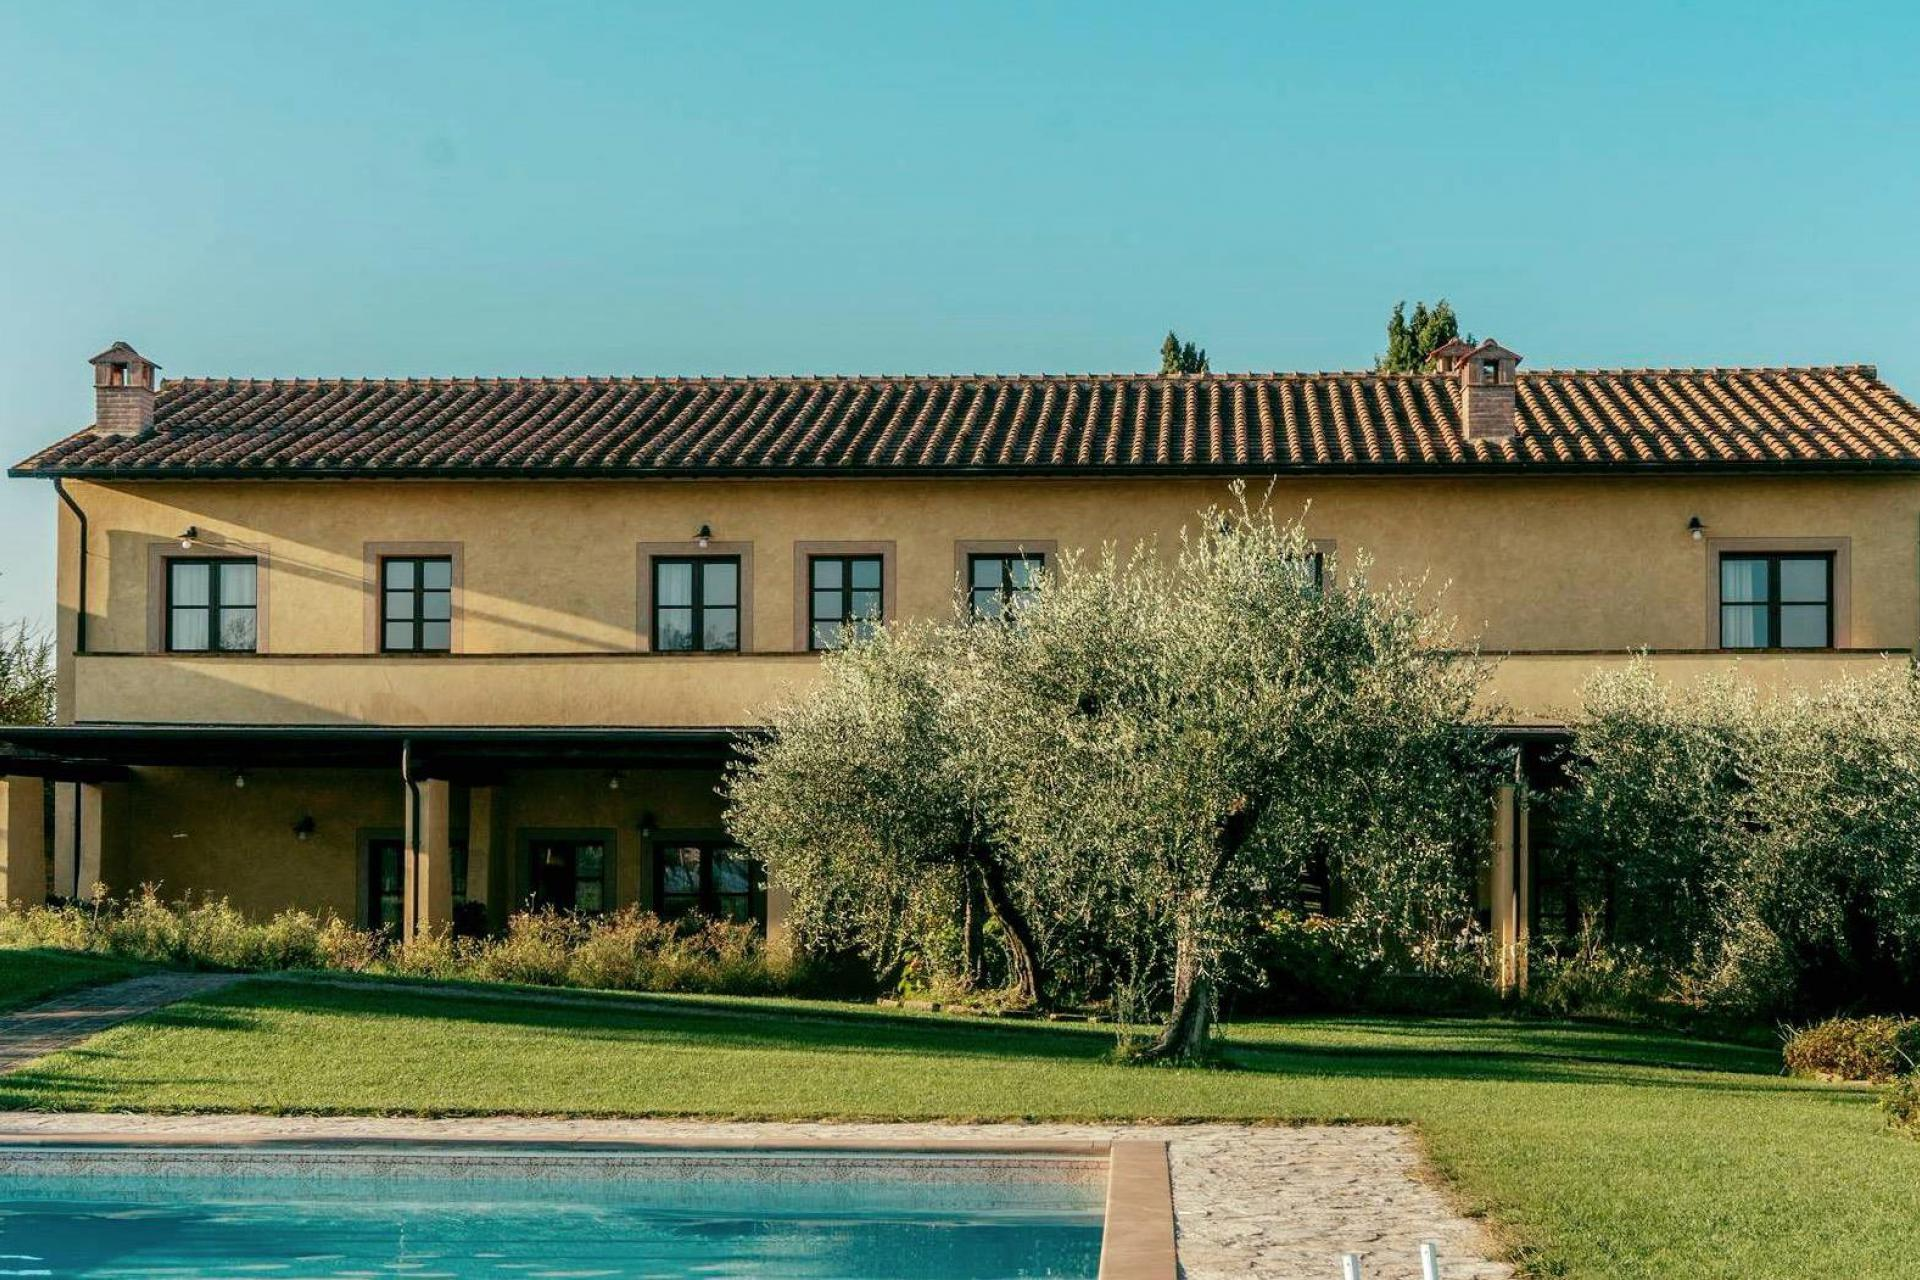 Agriturismo Toscane Agriturismo Toscane, gemoedelijk tussen de wijngaarden